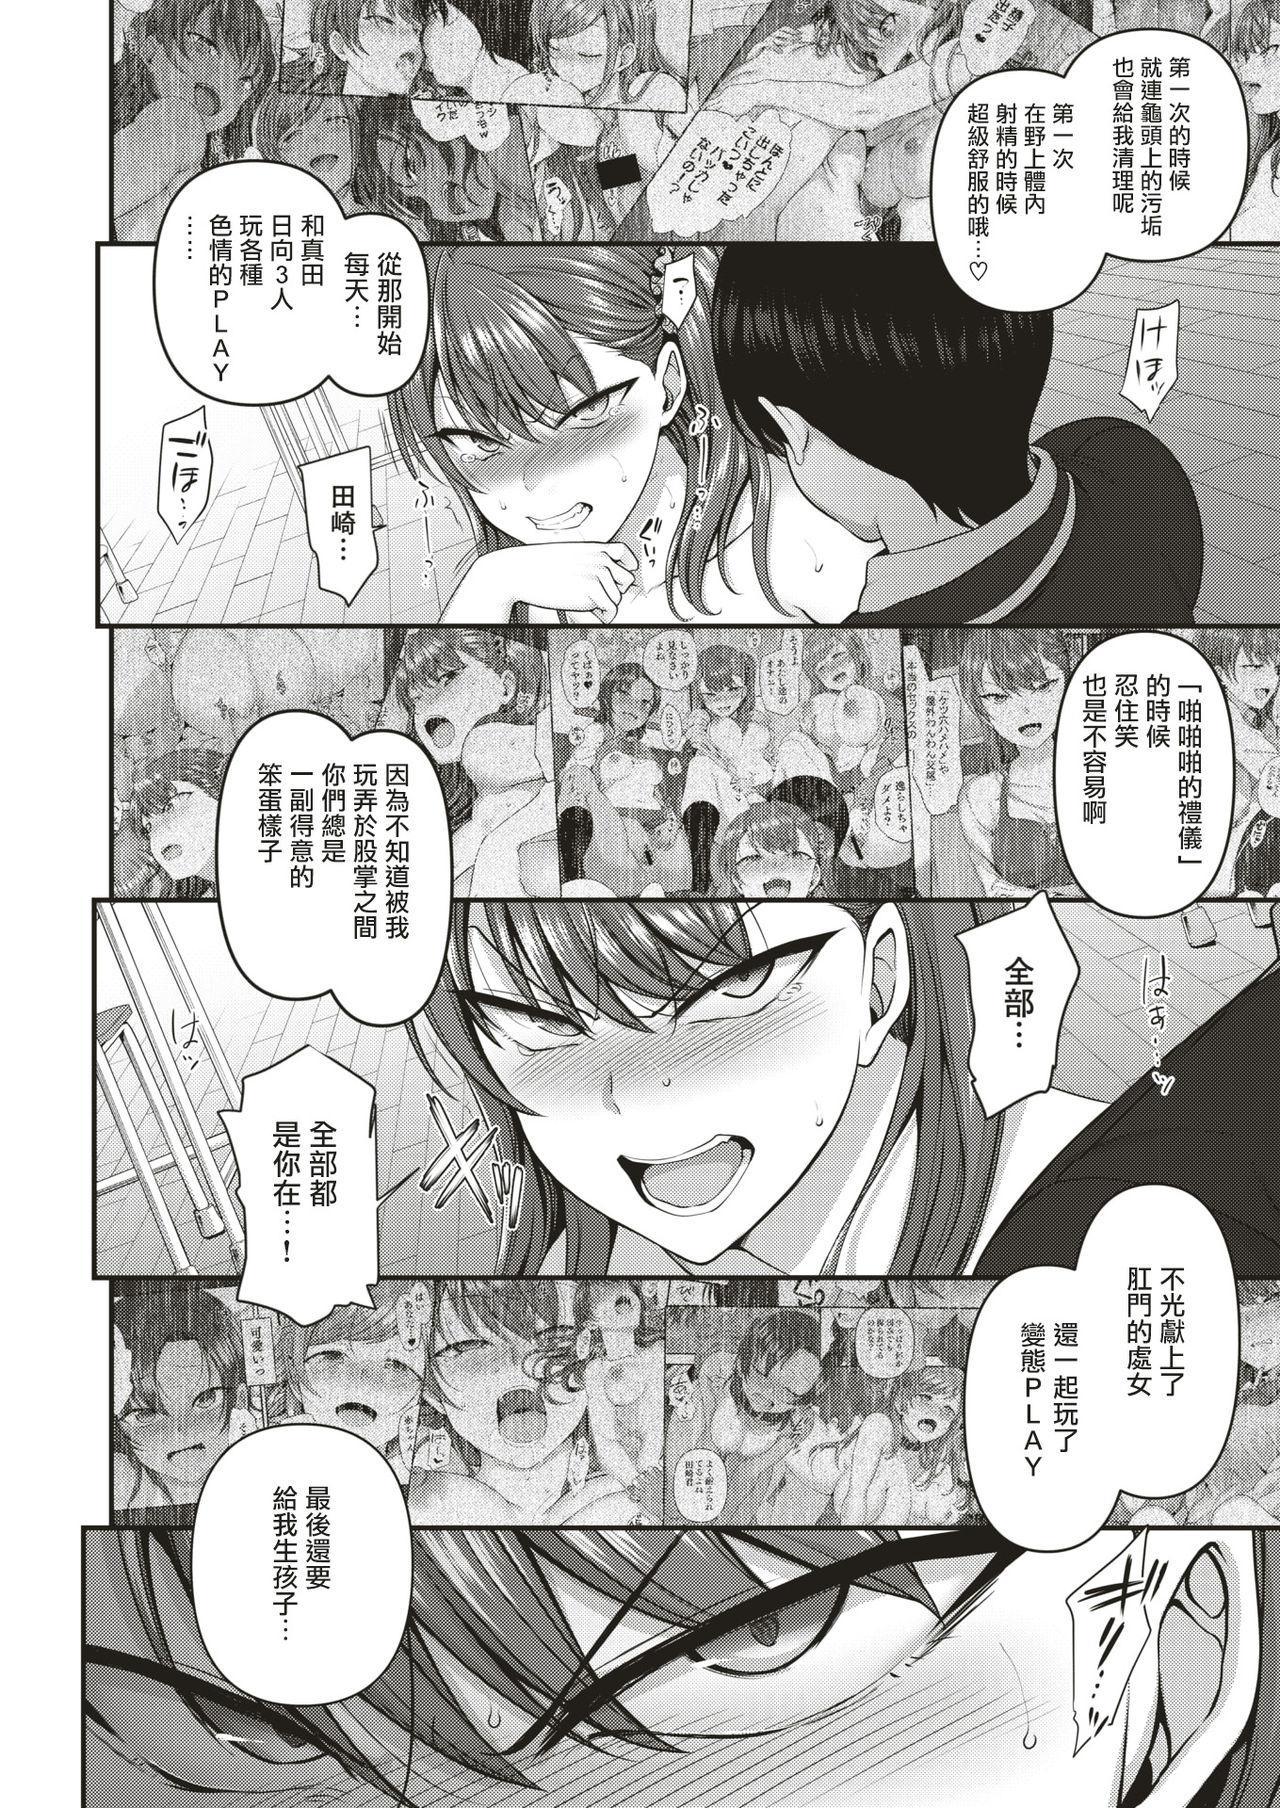 [Aiue Oka] Izirare ~Hukusyu Saimin~ #6  (COMIC X-EROS #70) [Chinese] [白姬漢化] [Digital] 19